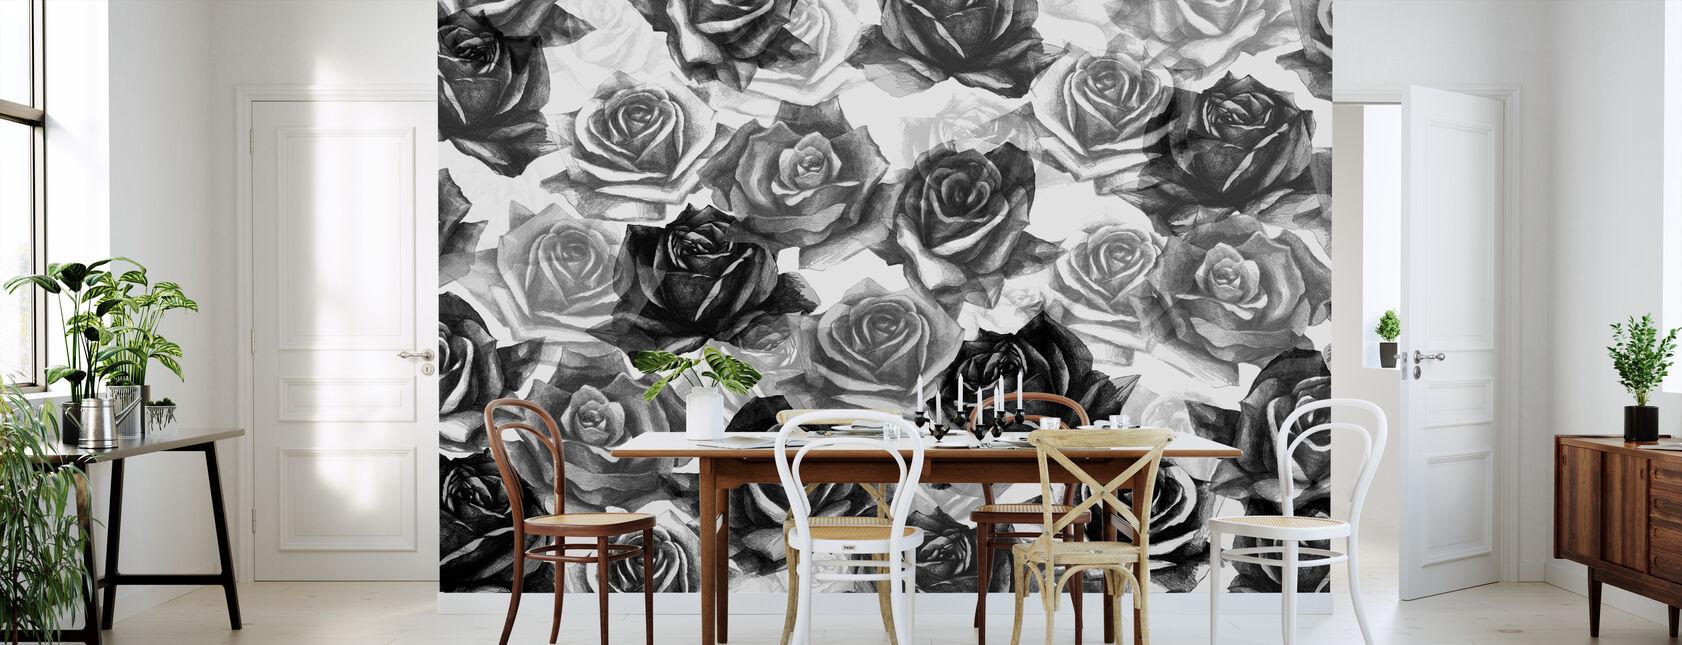 My Black Roses - Wallpaper - Kitchen